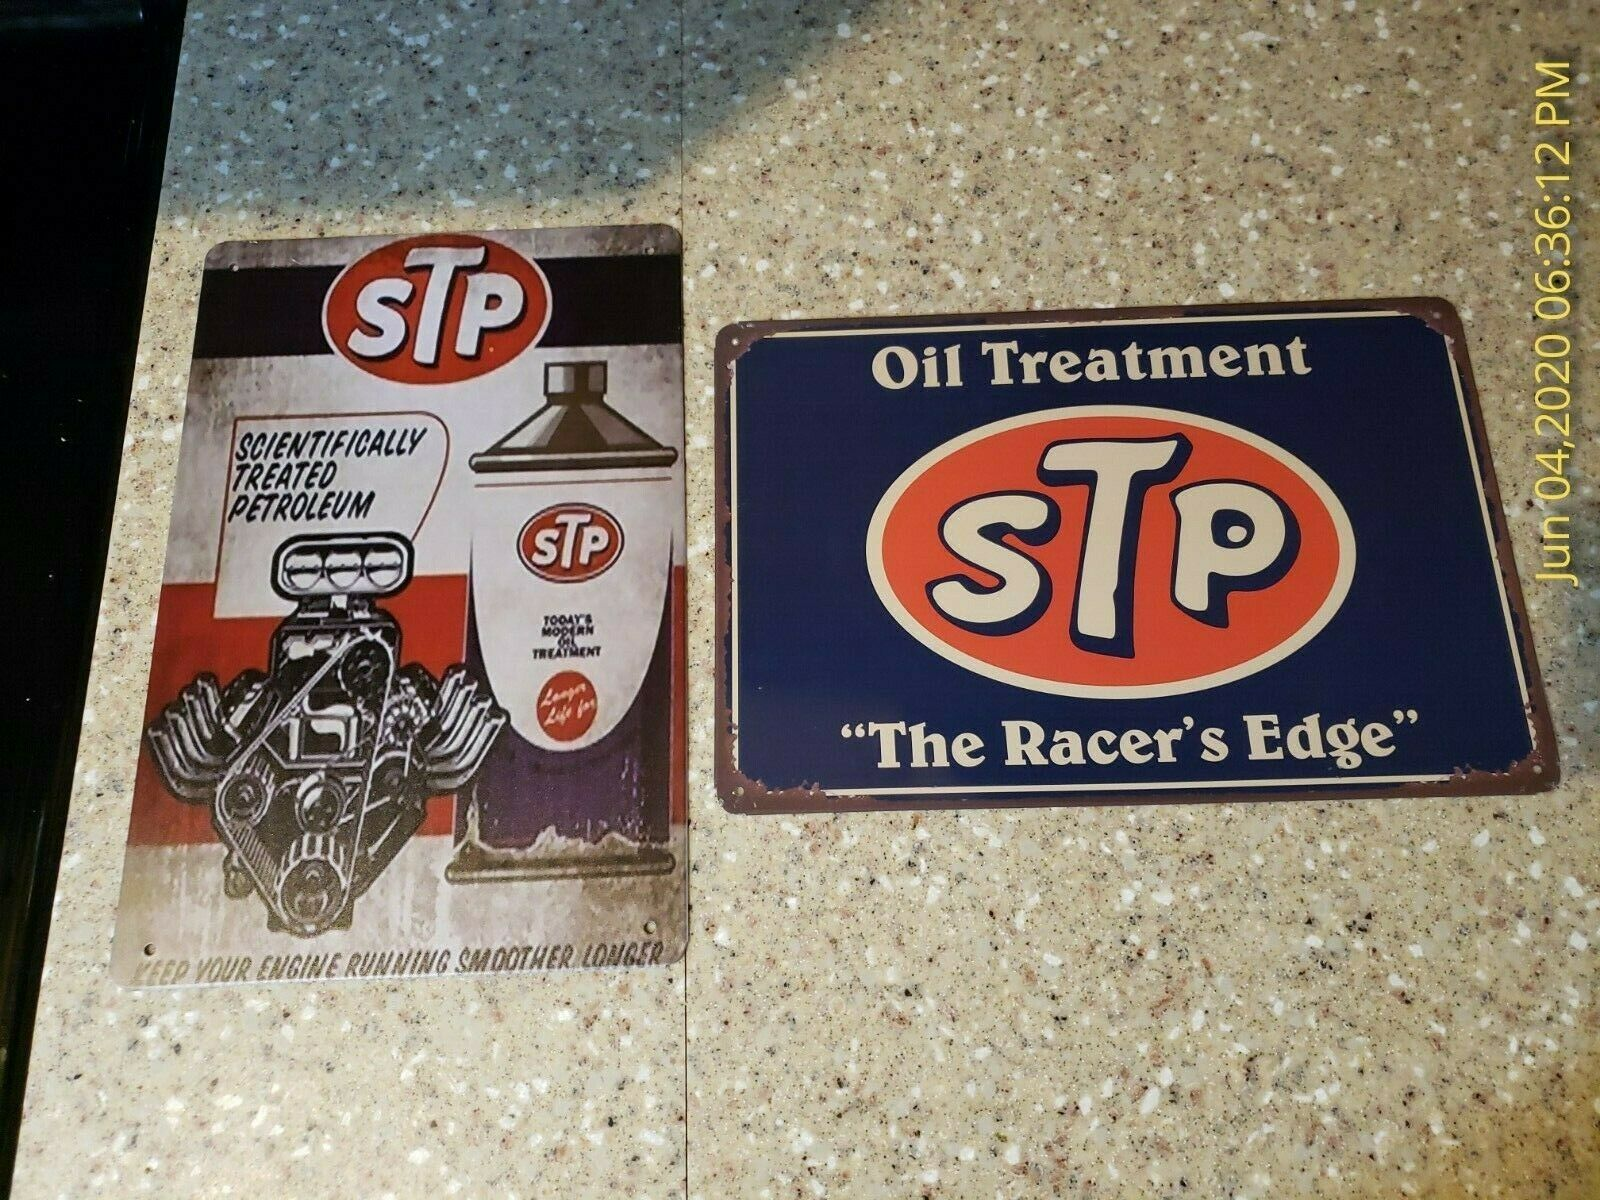 oil treatment STP racer edge tin metal sign nostalgic room wall decor